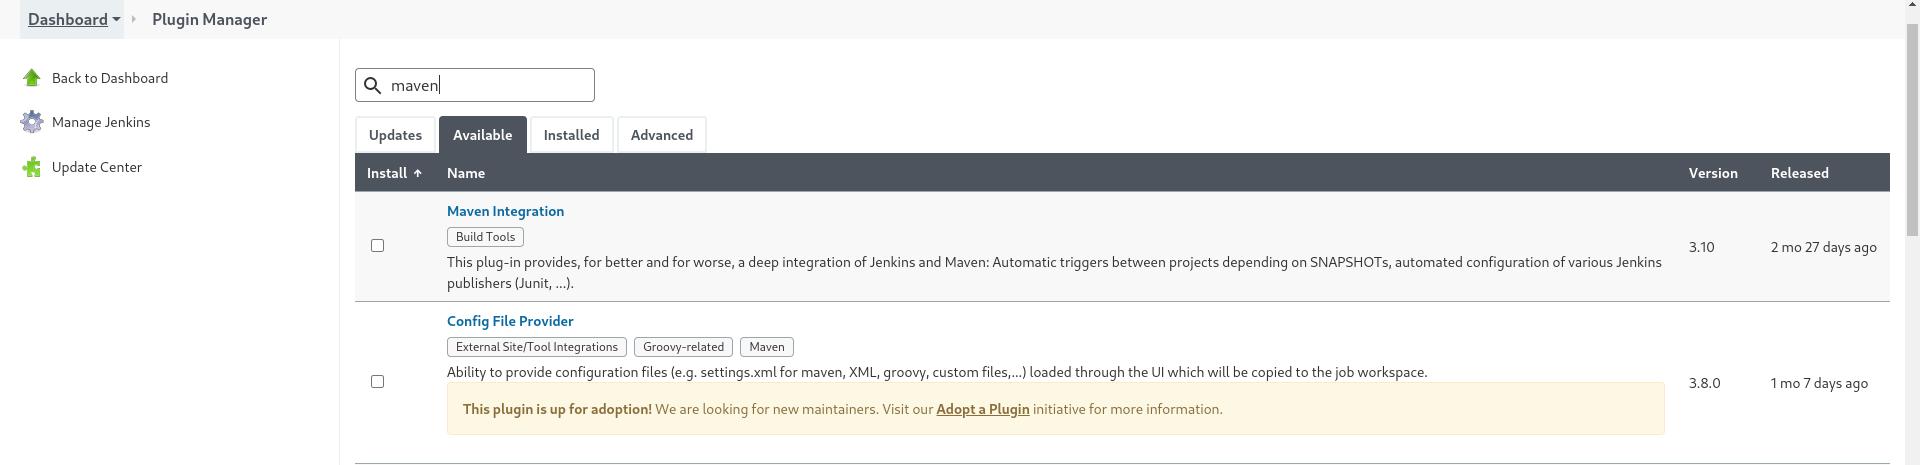 Maven Integration plugin